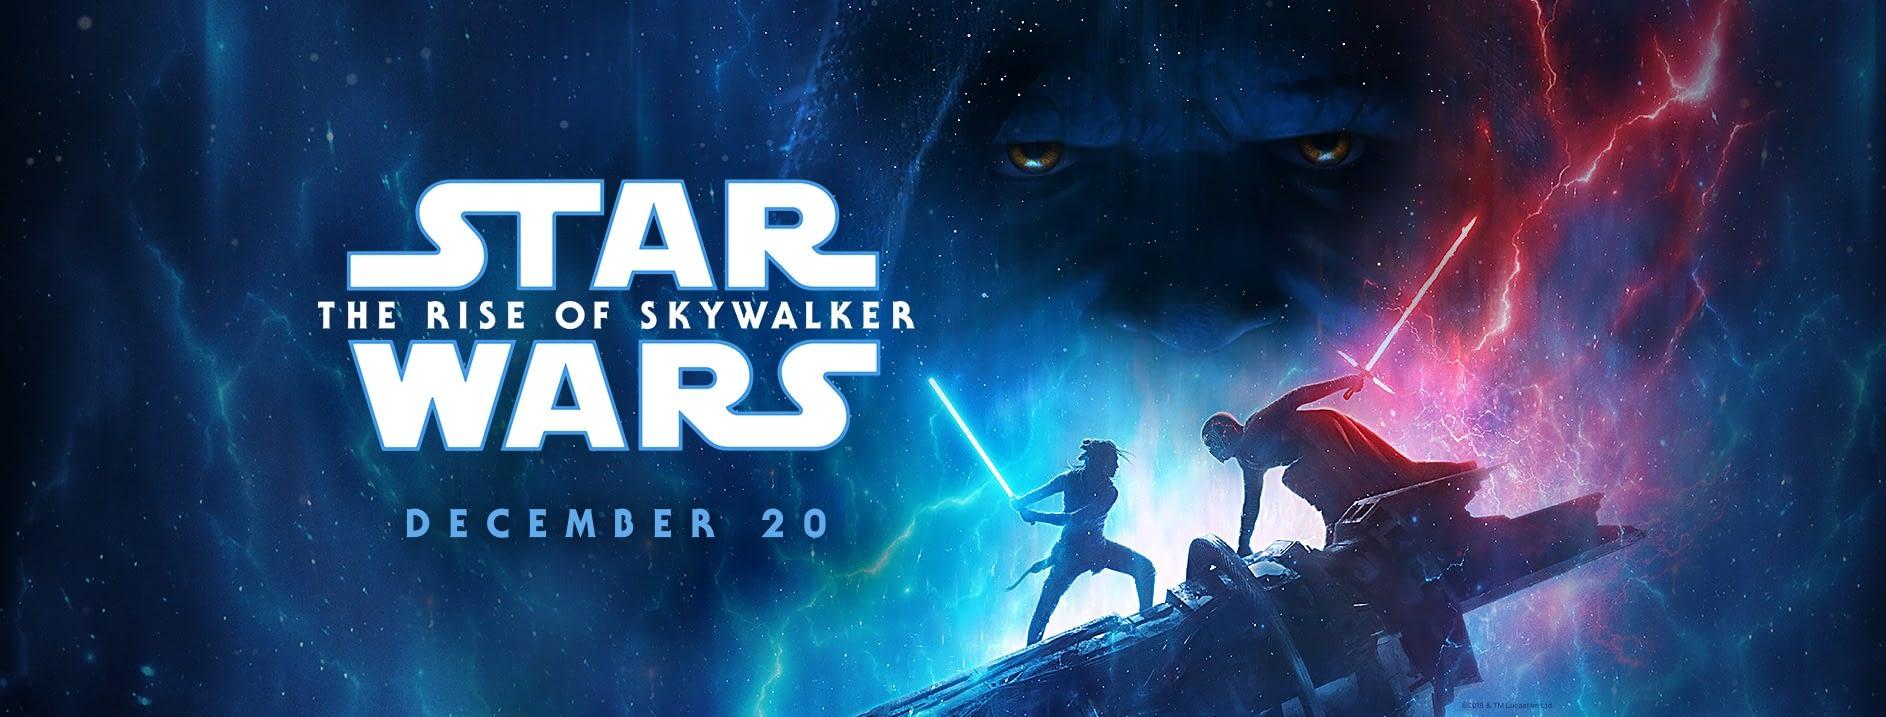 Resultado de imagem para STAR WARS: THE RISE OF SKYWALKER (DECEMBER 20, 2019)